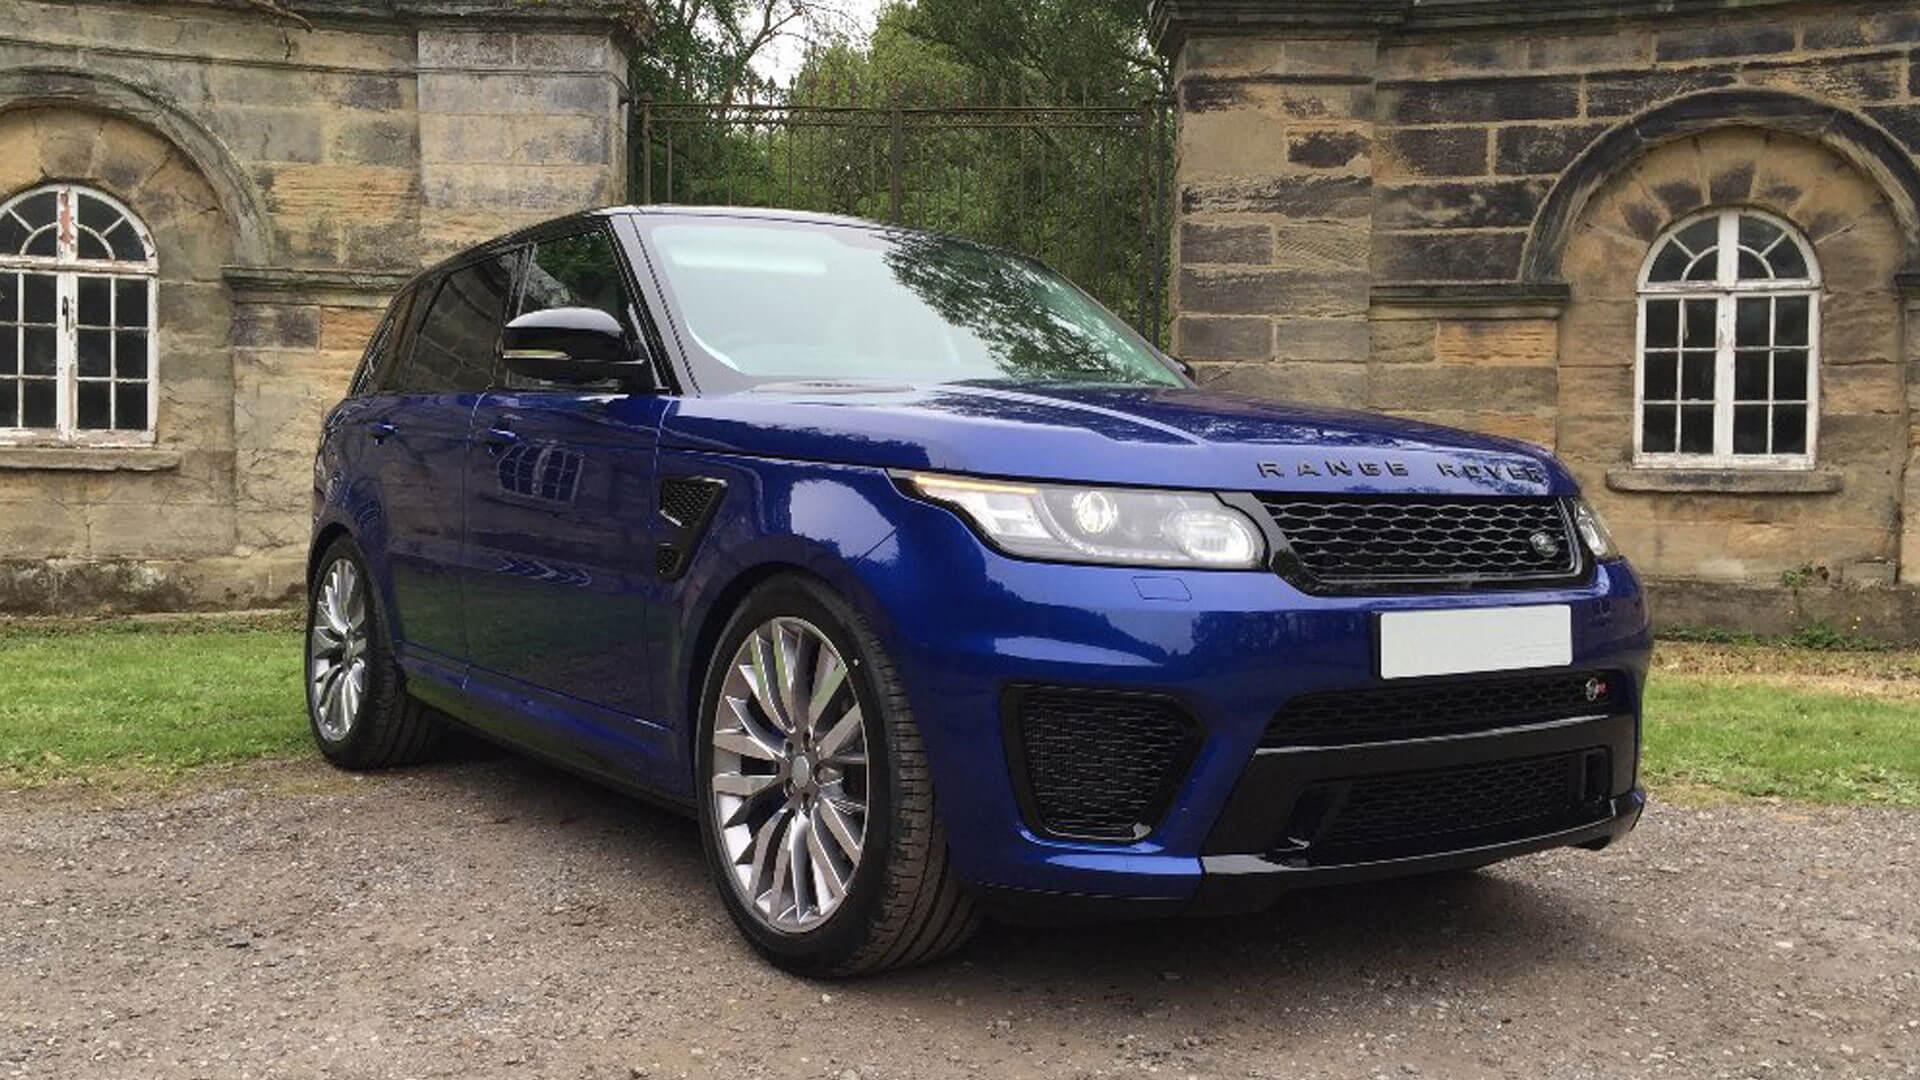 Range Rover Sport Svr Hire Svr Rental And Hire Packages